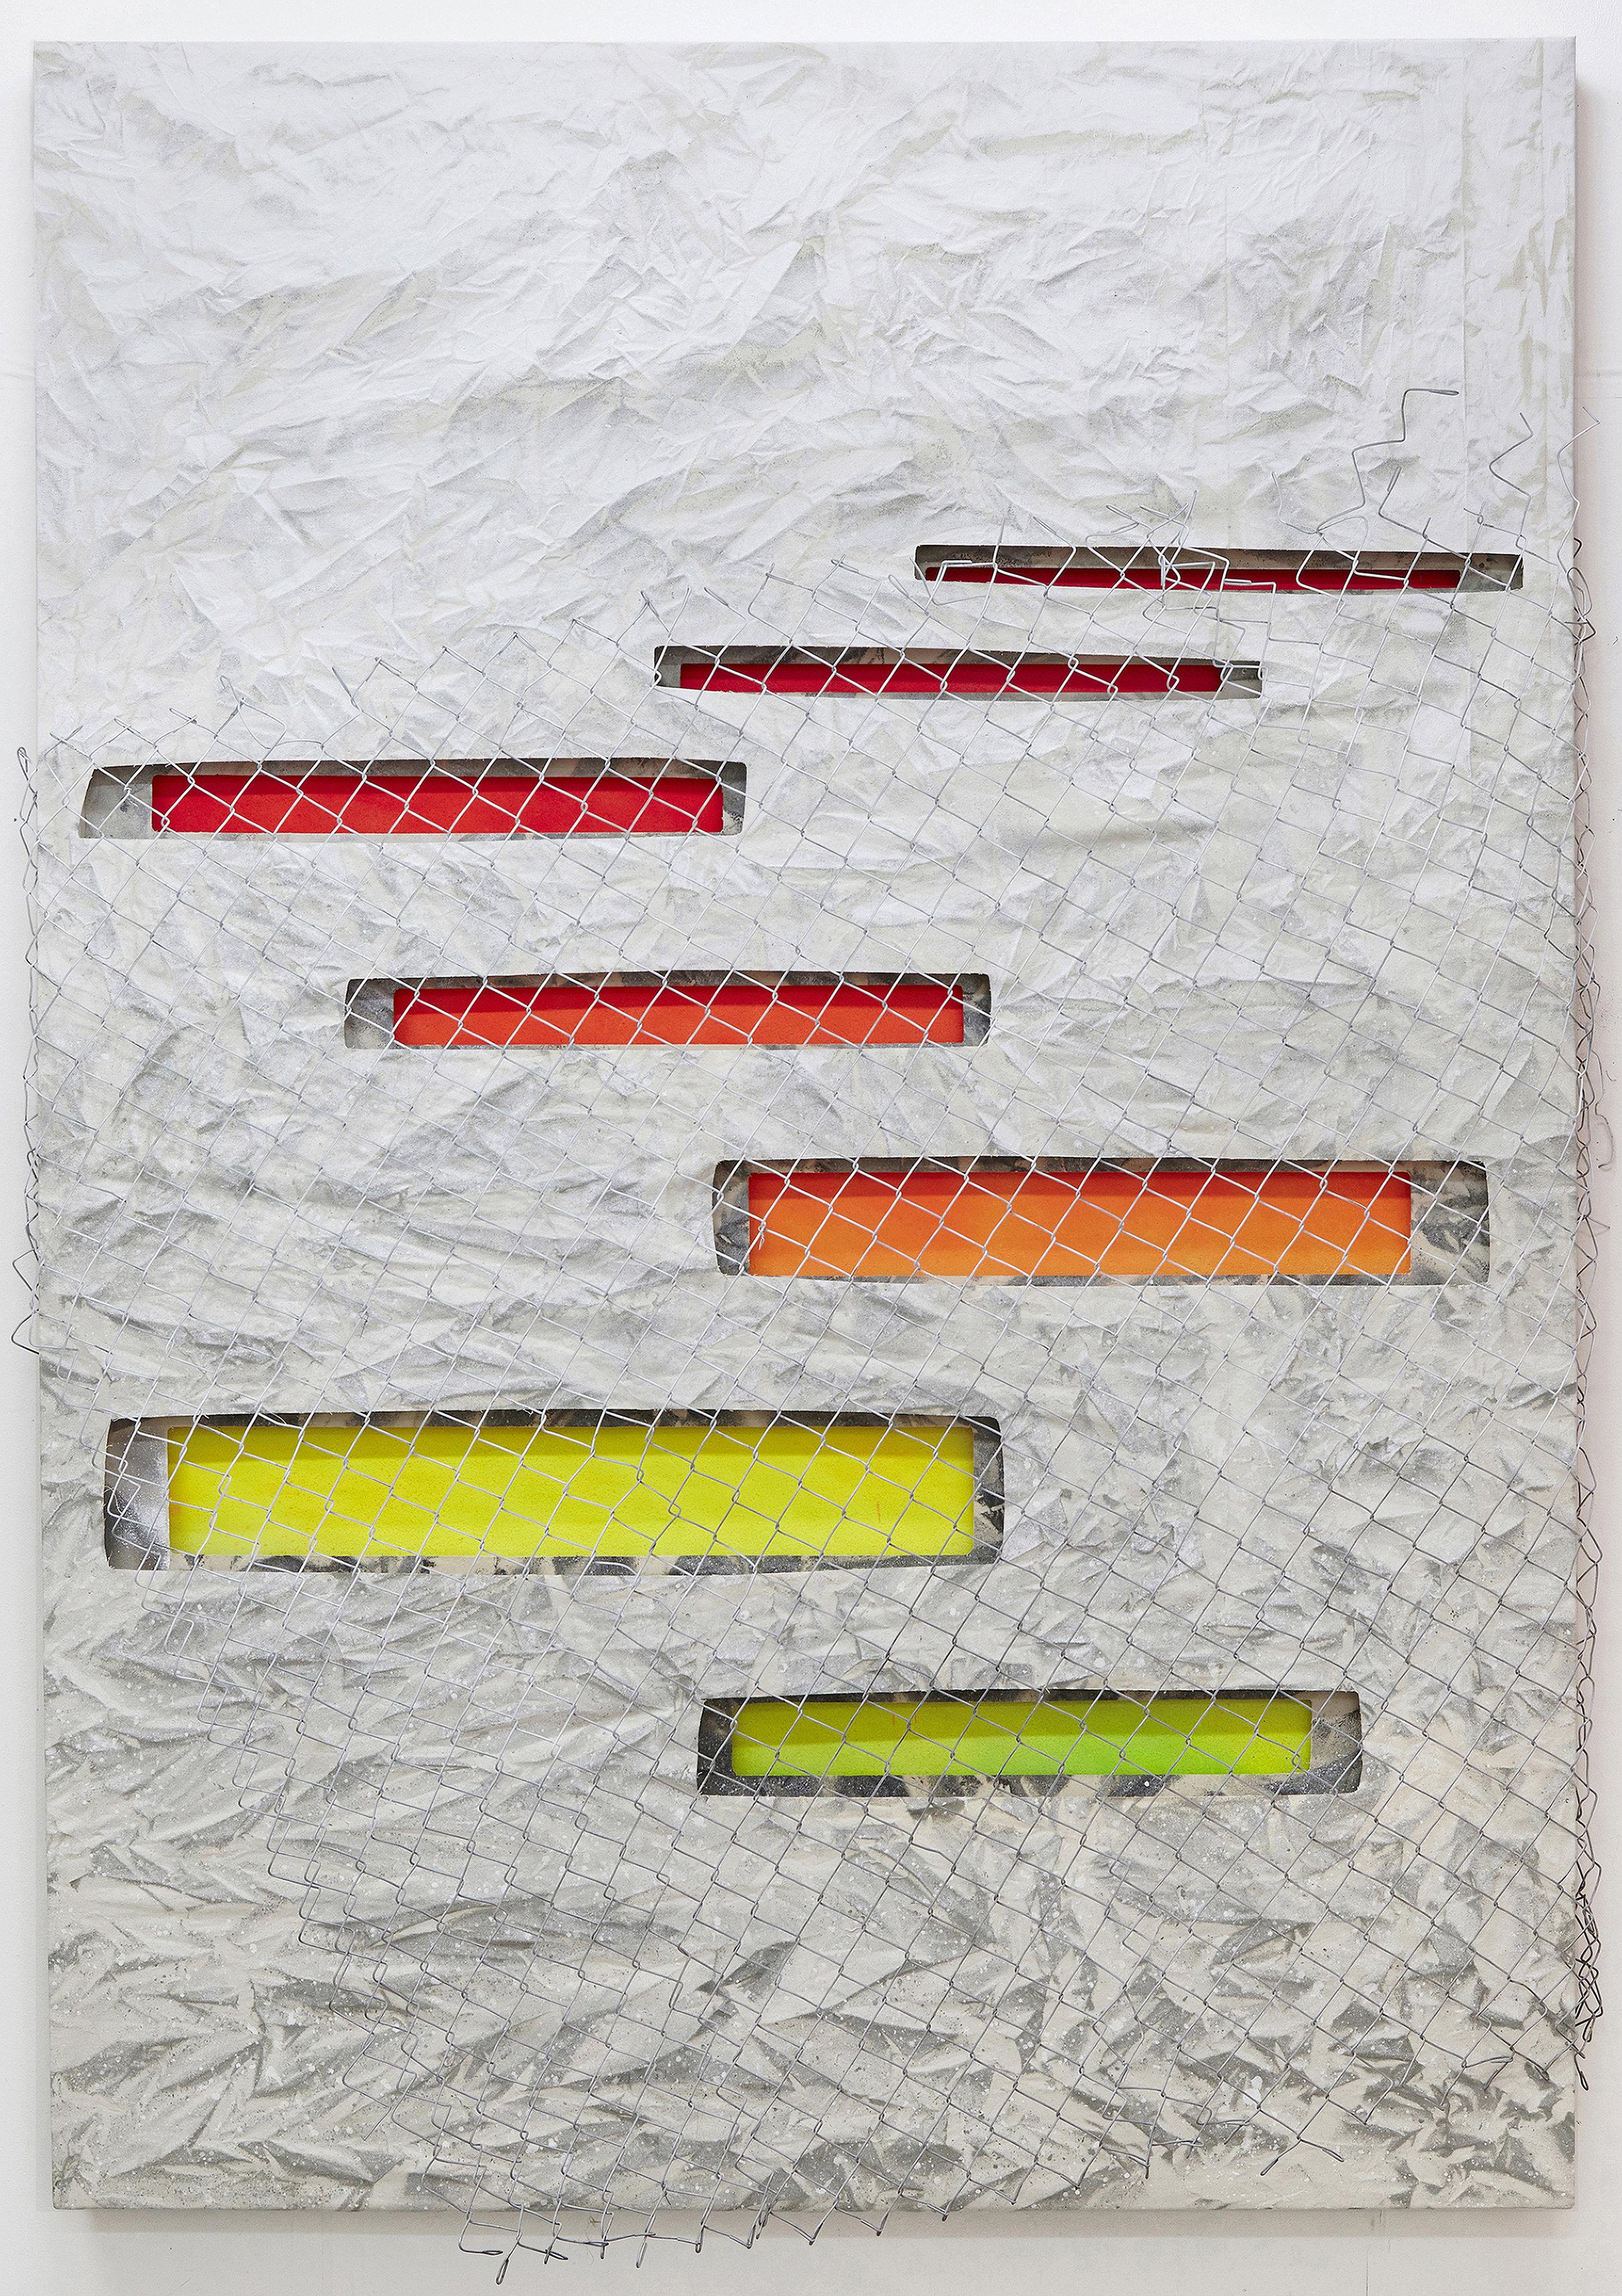 Low Culture Lasagne.   Alkyd resin, fence & triple canvas.  243 x 172 cm.  London, 2016.